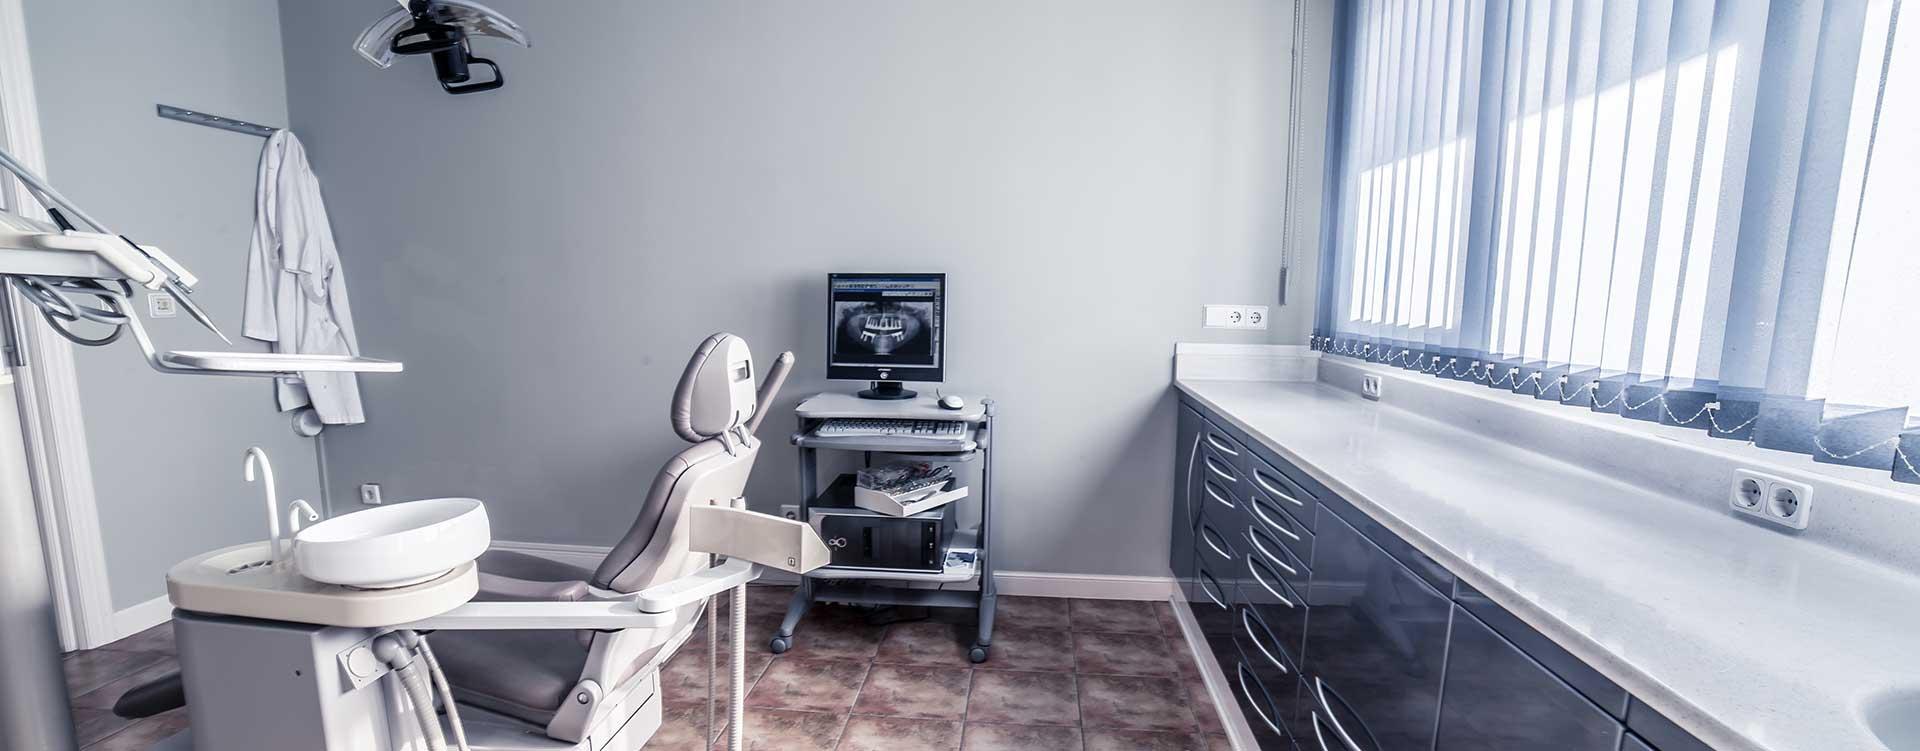 clinica-gorosabel-dental-instalaciones-6